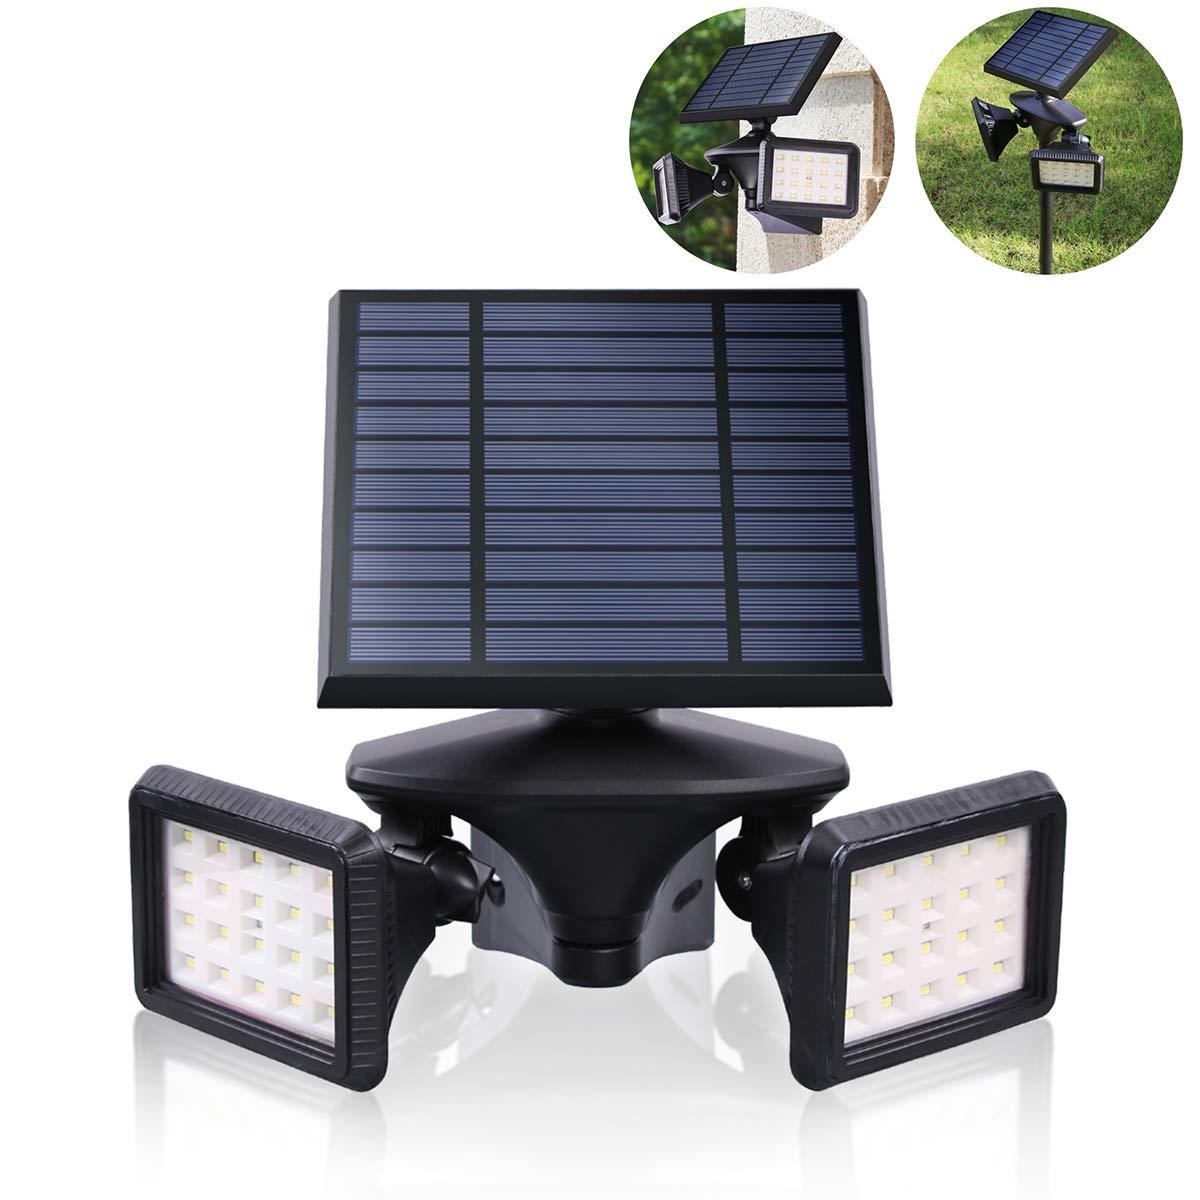 Motion Sensor Solar Lights Outdoor, Dusk to Dawn Wireless Security LED Flood Light, 6000K 40LEDs Very Bright, 2-in-1 Solar Powered Landscape spot Lights Waterproof for Garden/Driveway/Porch, EMANER by EMANER